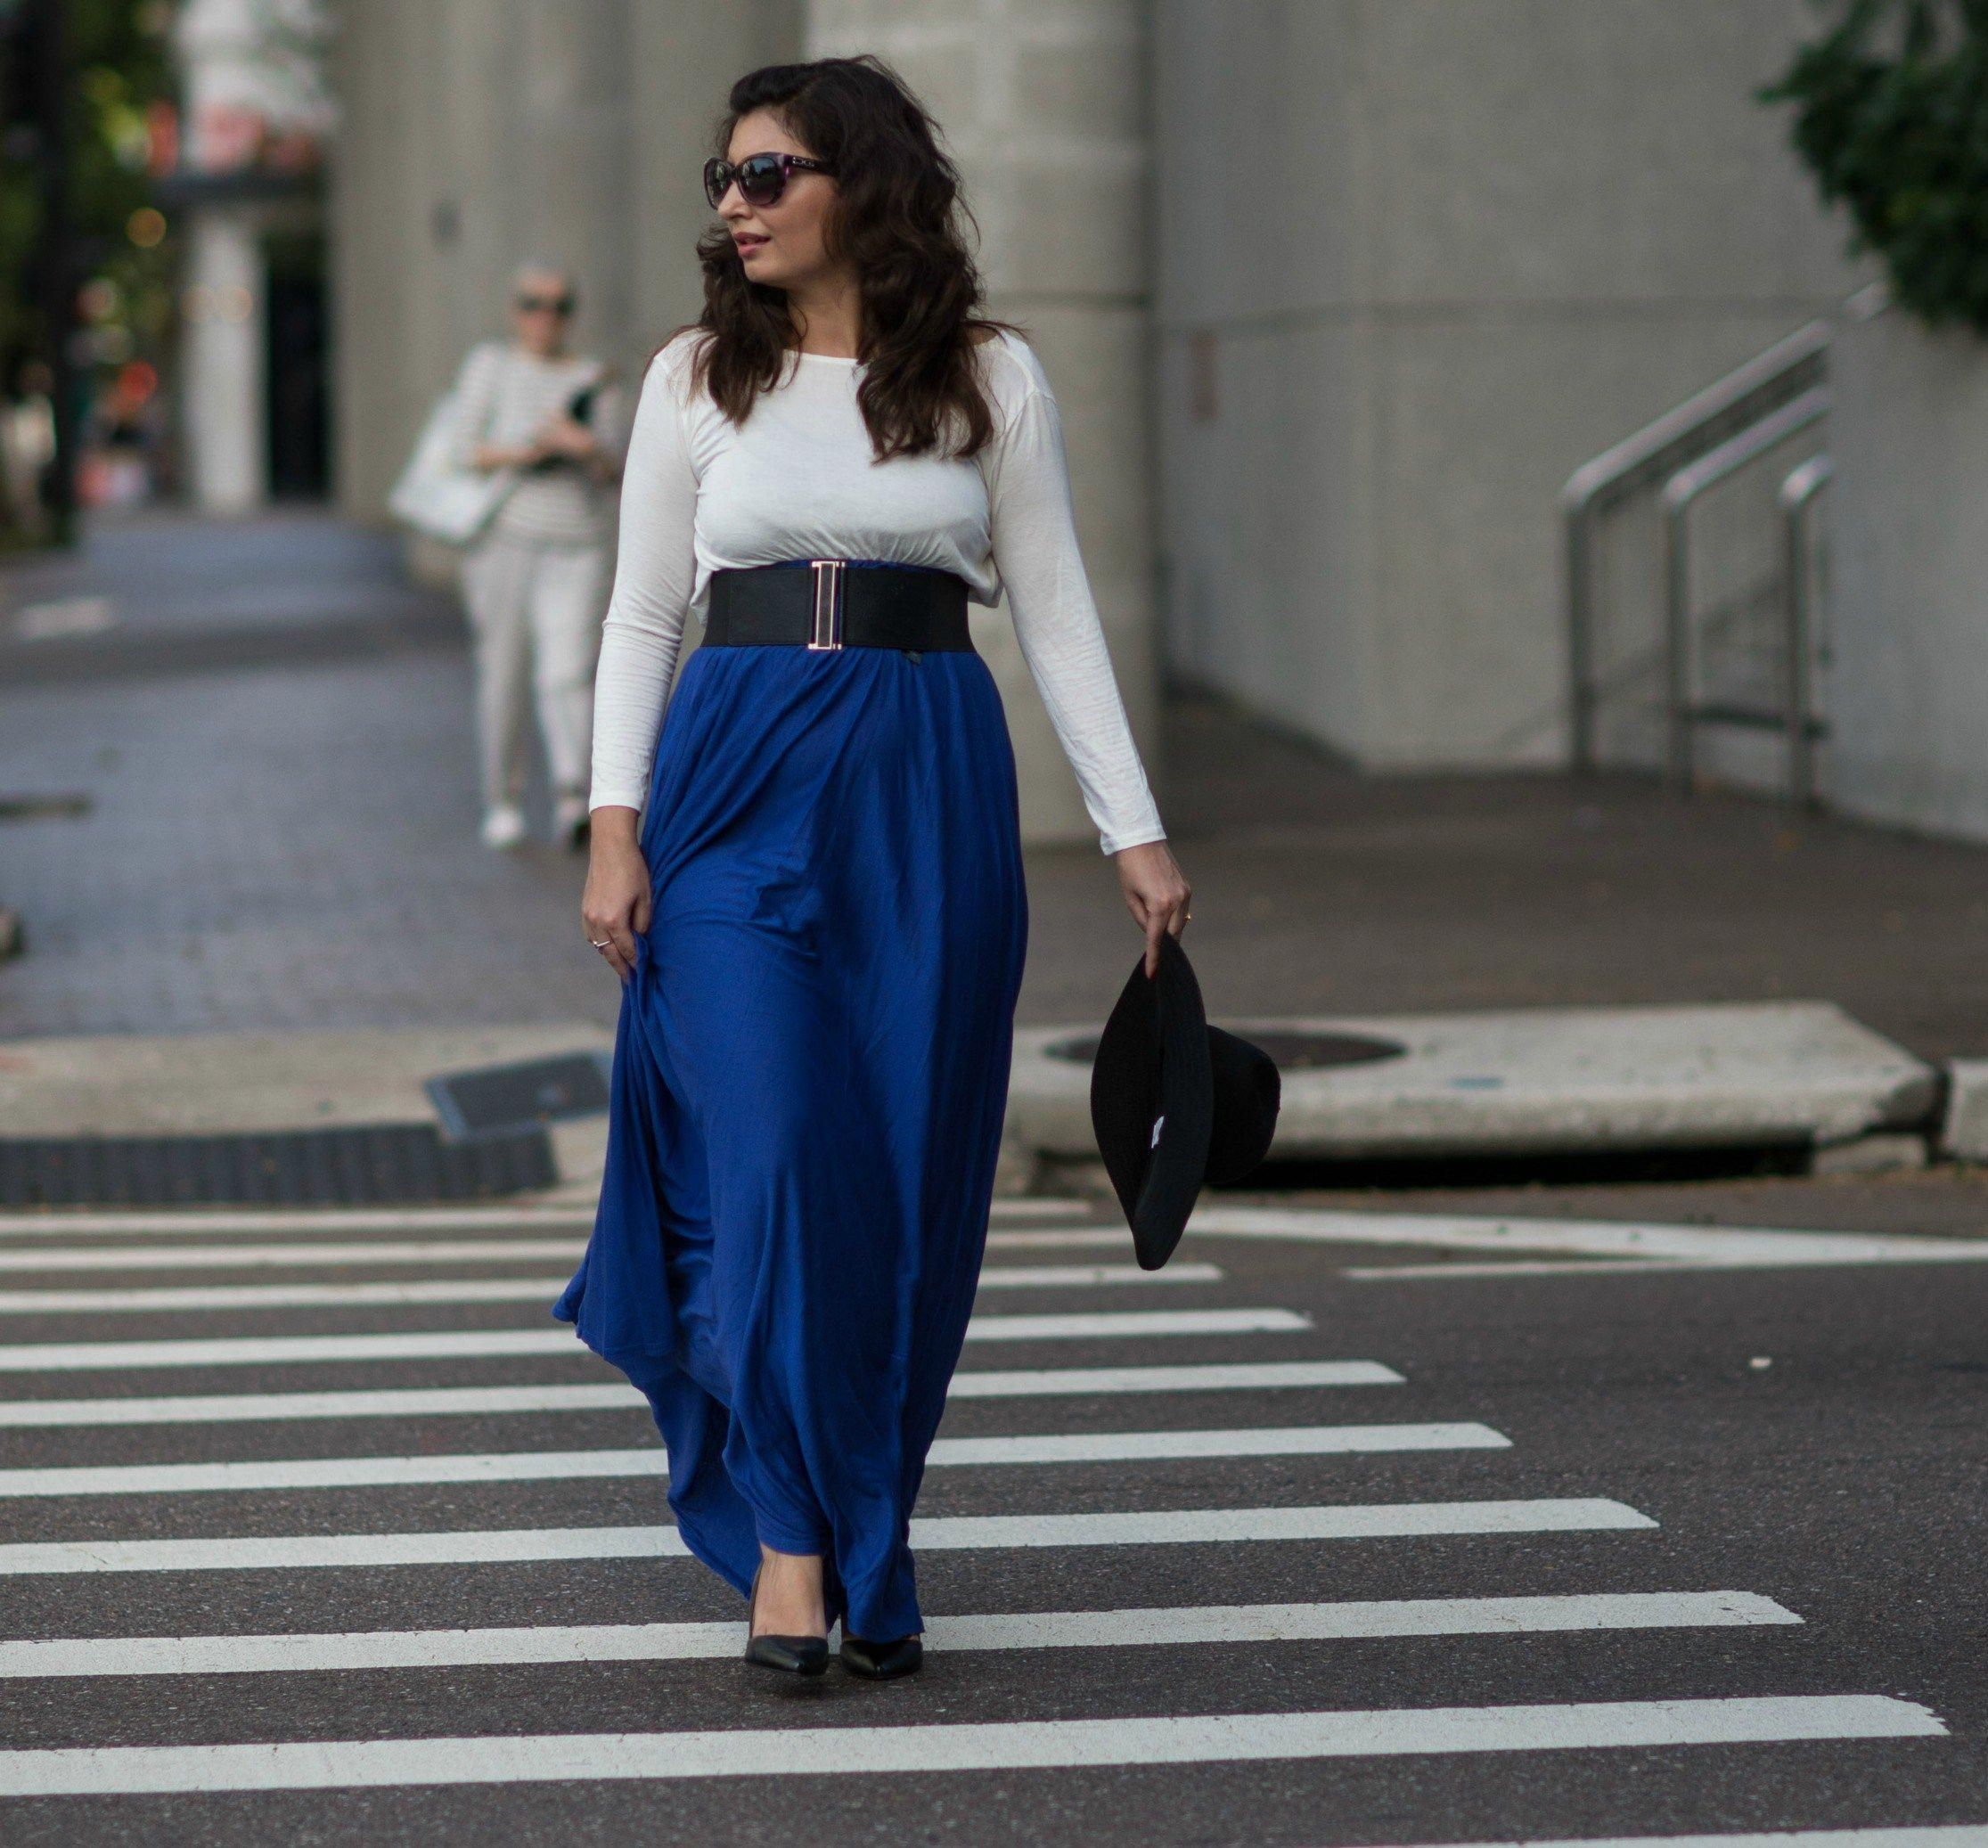 6 Best Clever Ideas: Urban Fashion Editorial Colour urban fashion trends sweaters.Urban Fashion Photoshoot Hair urban fashion show new york.Urban Fash…